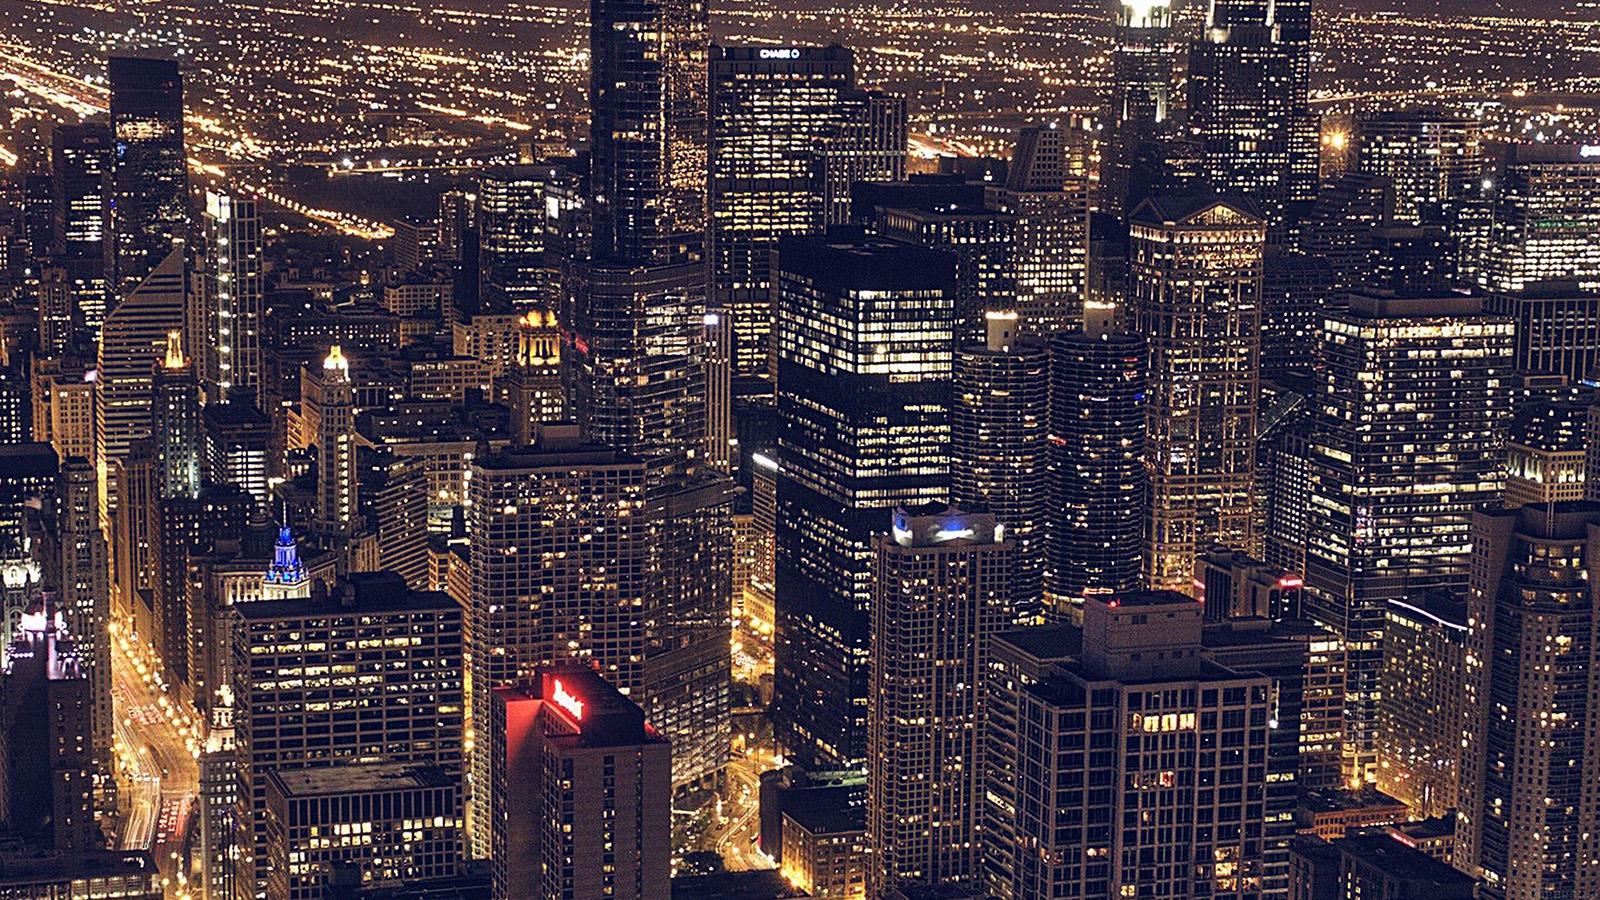 the darkness essay Essay on joseph conrad's heart of darkness civilization vs the heart of darkness konstantin shestopaloff may 2, 2013 the progress of humanity over the last few.